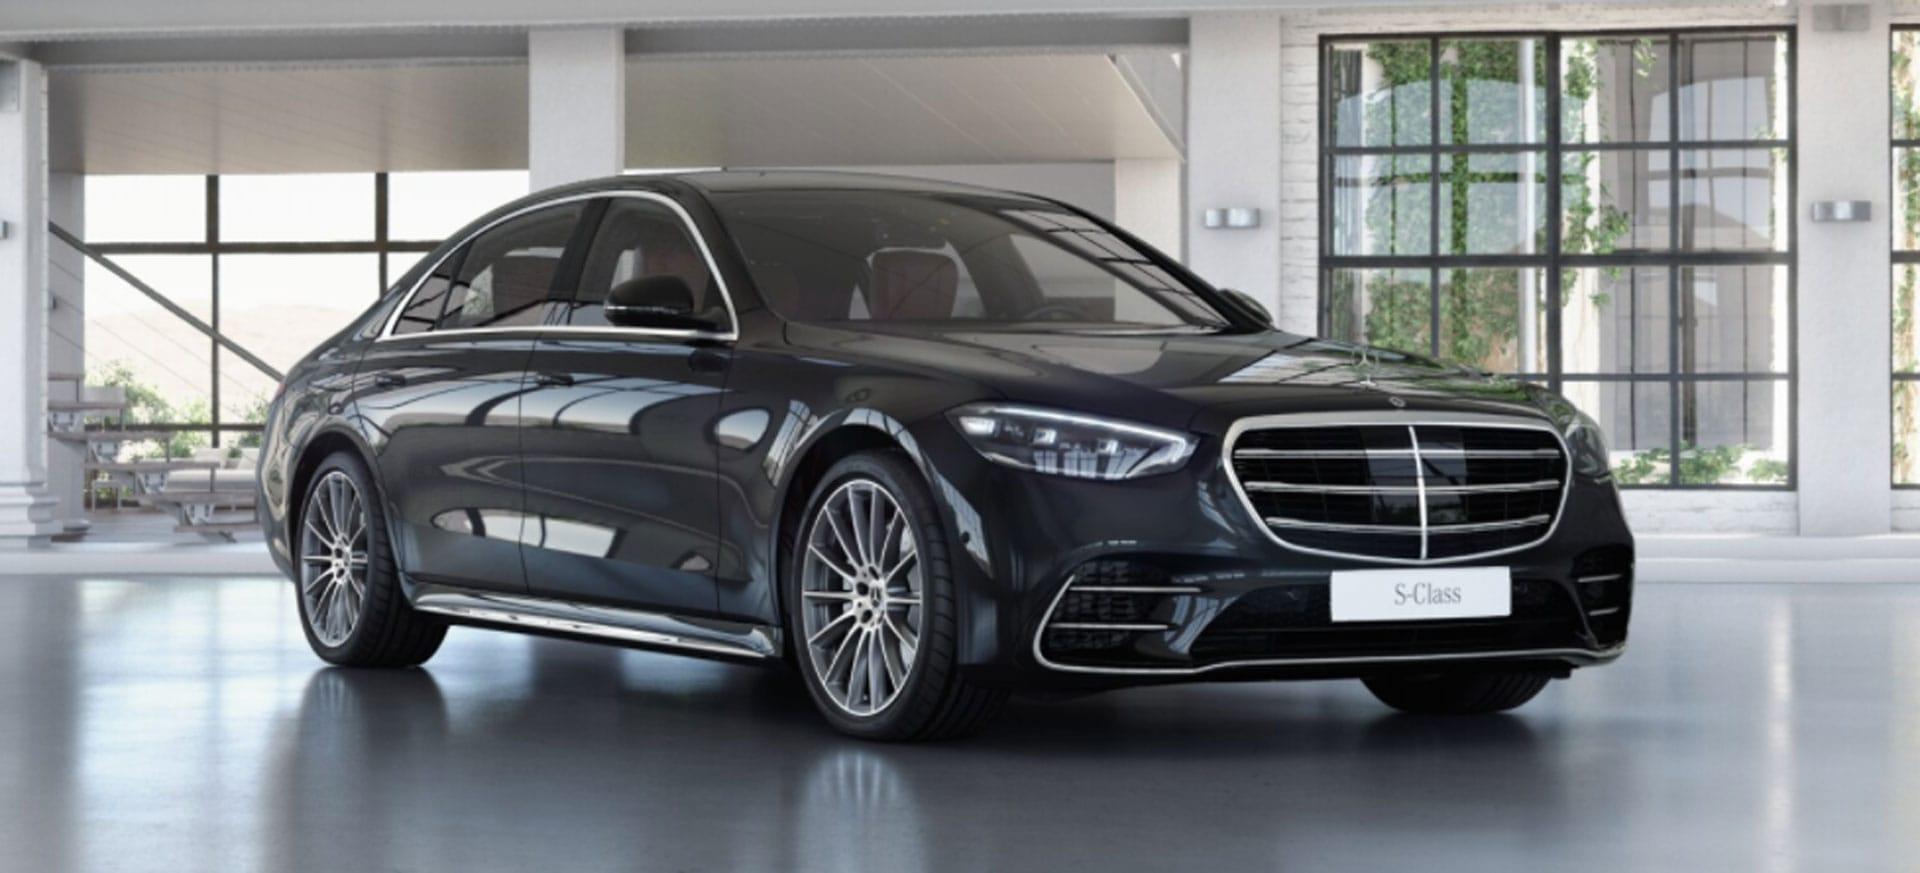 Mercedes-Benz S-Class Limousine 0152600354